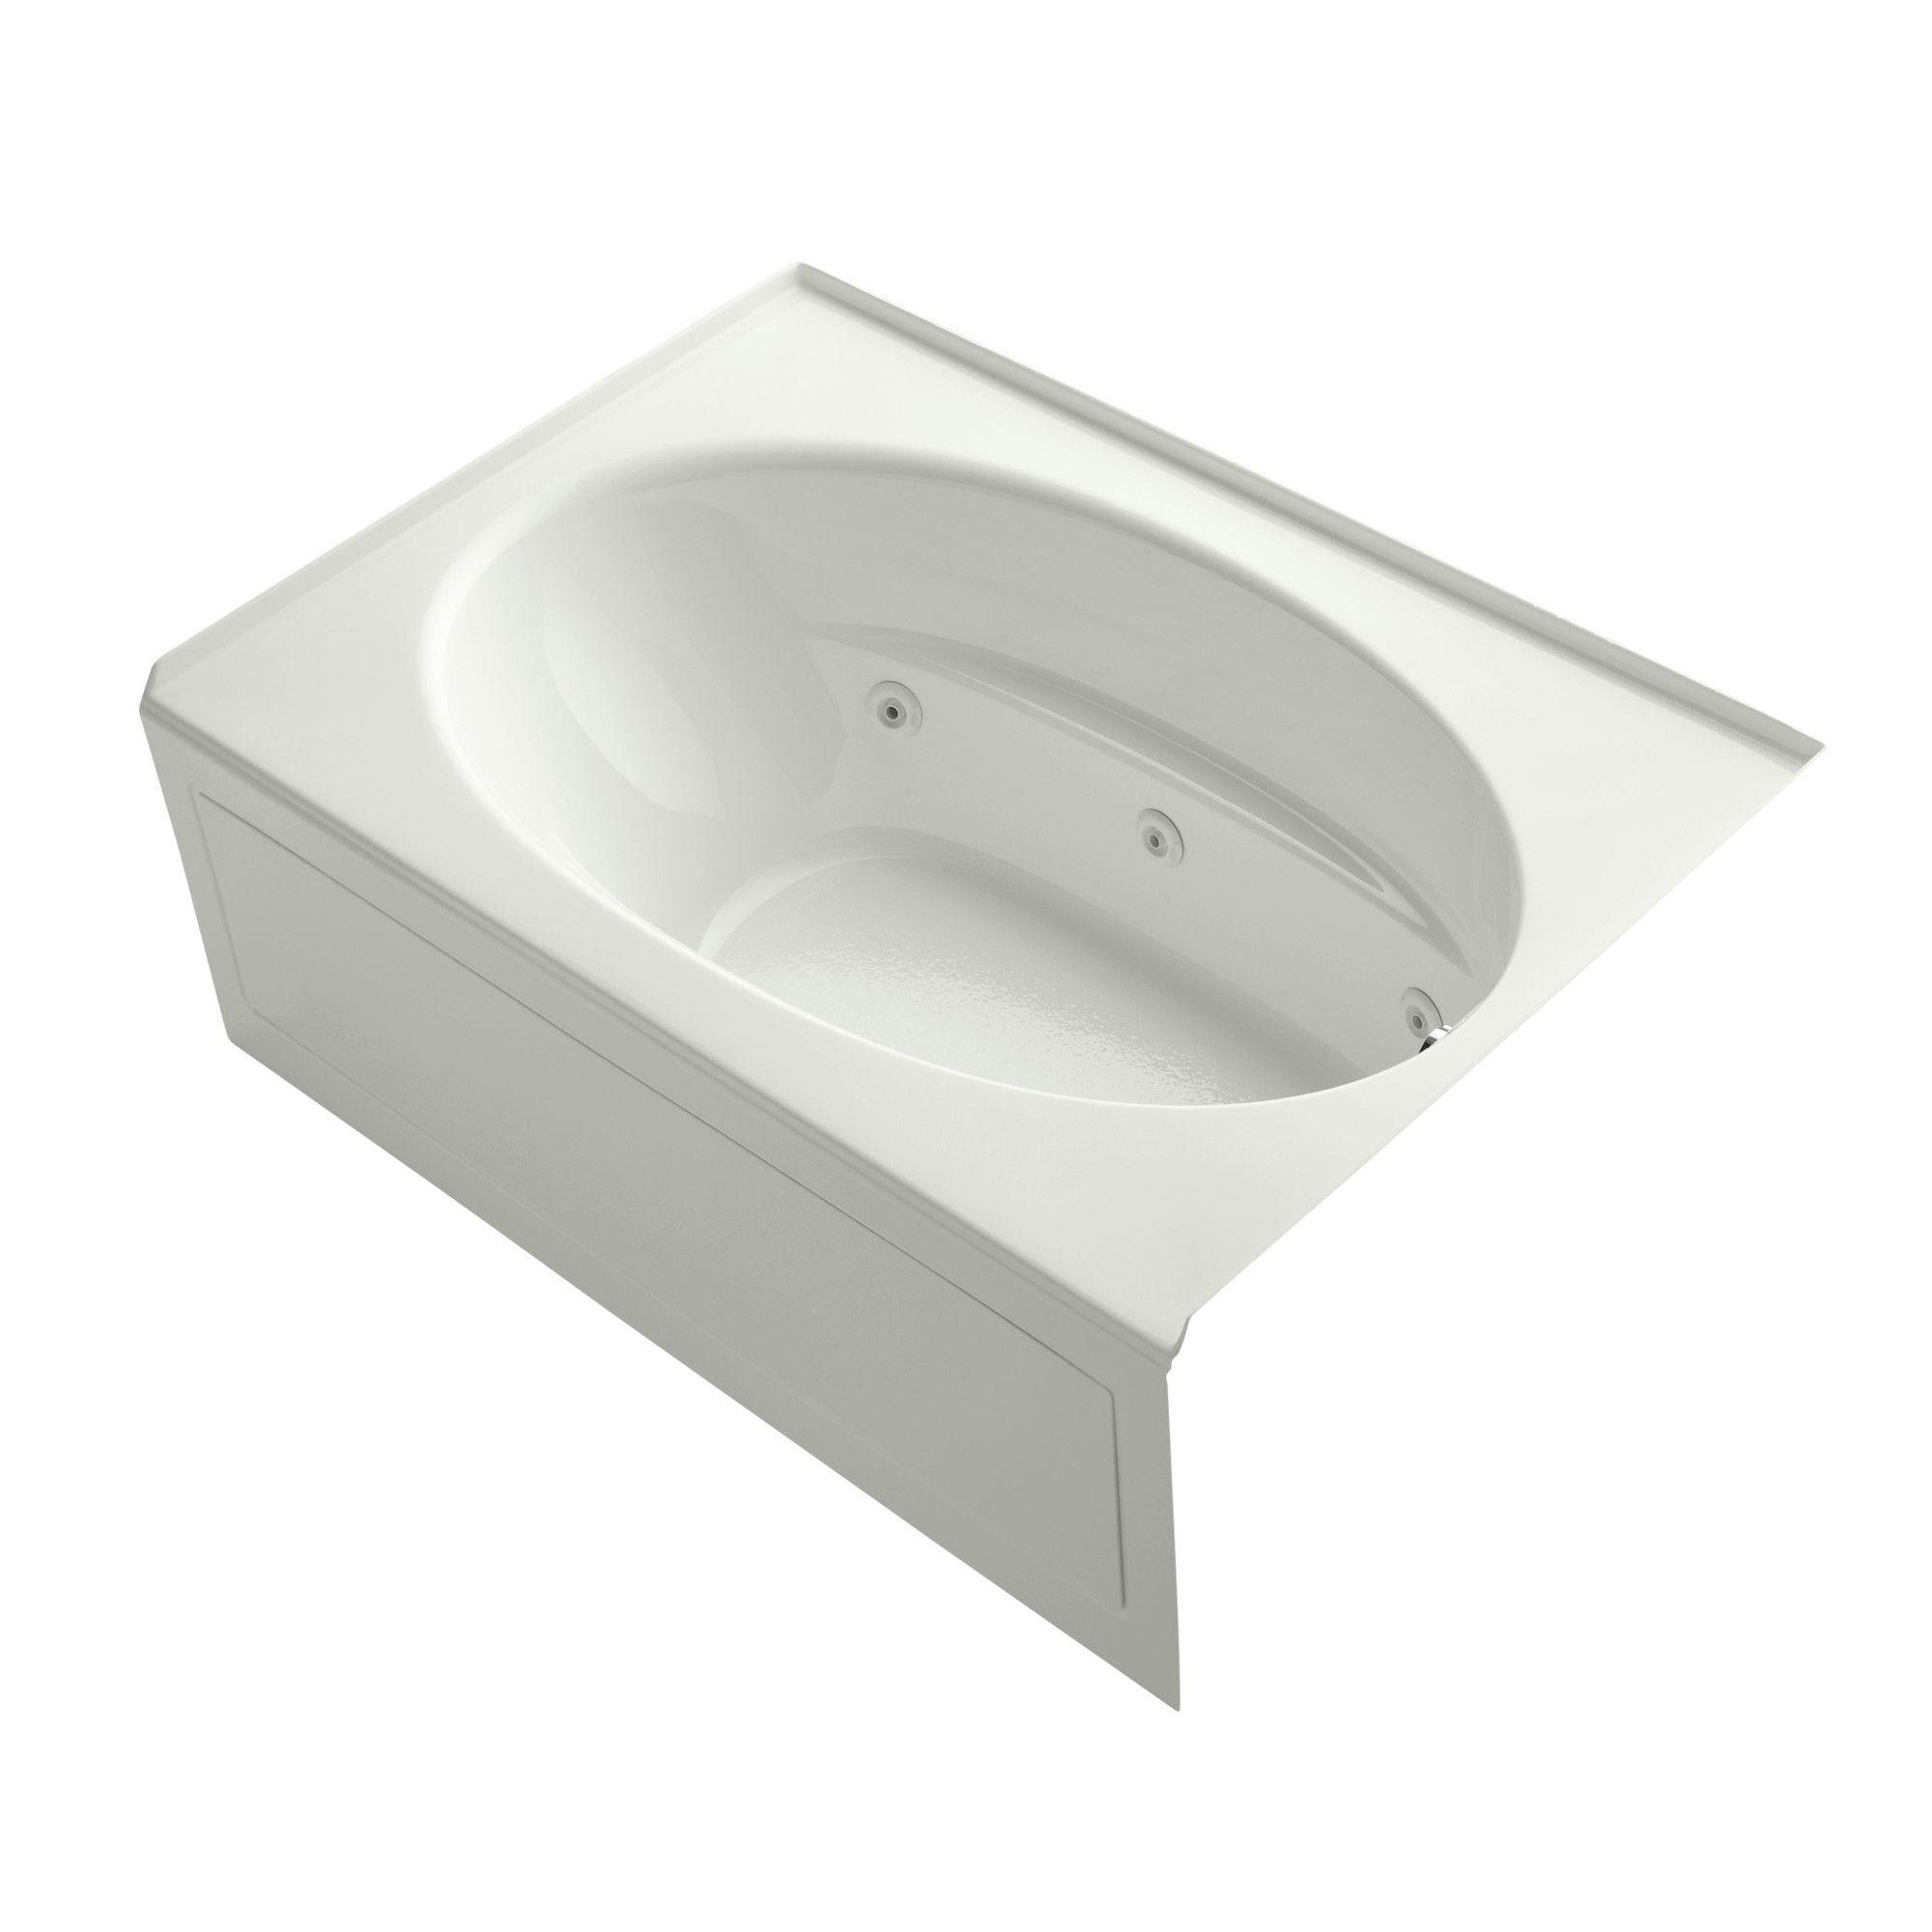 "Windward 60"" x 42"" Whirlpool Bathtub"